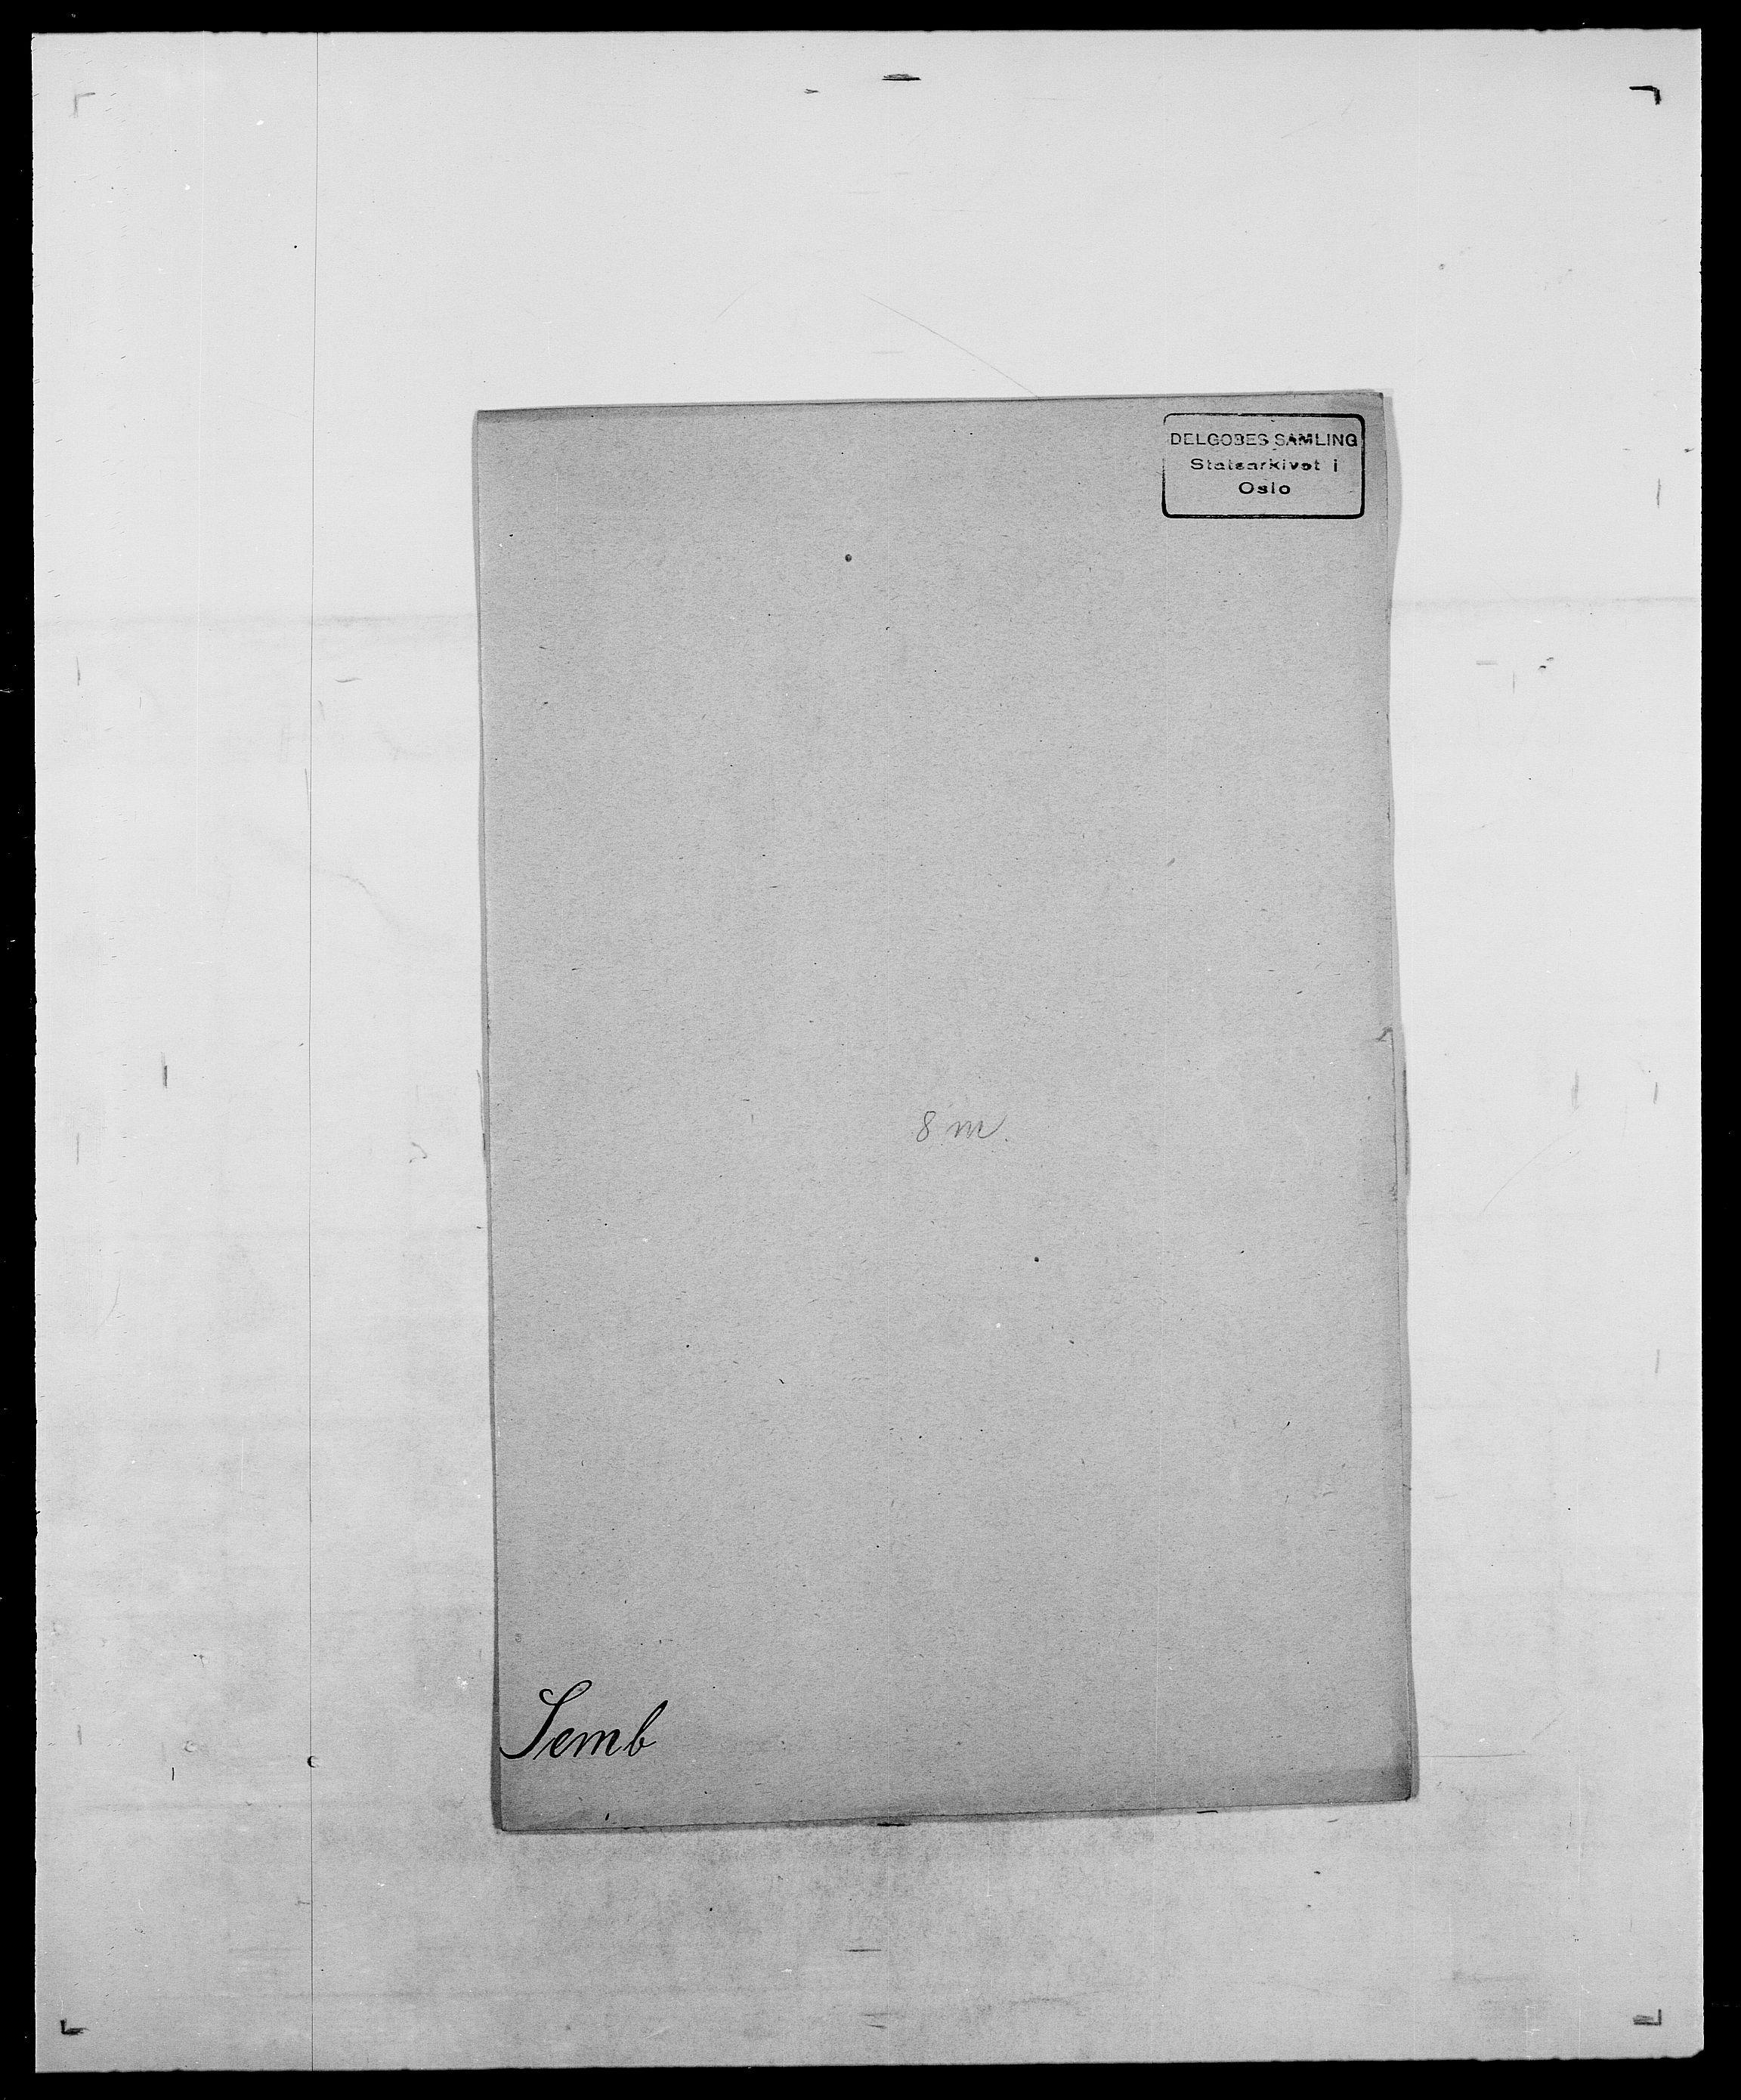 SAO, Delgobe, Charles Antoine - samling, D/Da/L0035: Schnabel - sjetman, s. 696